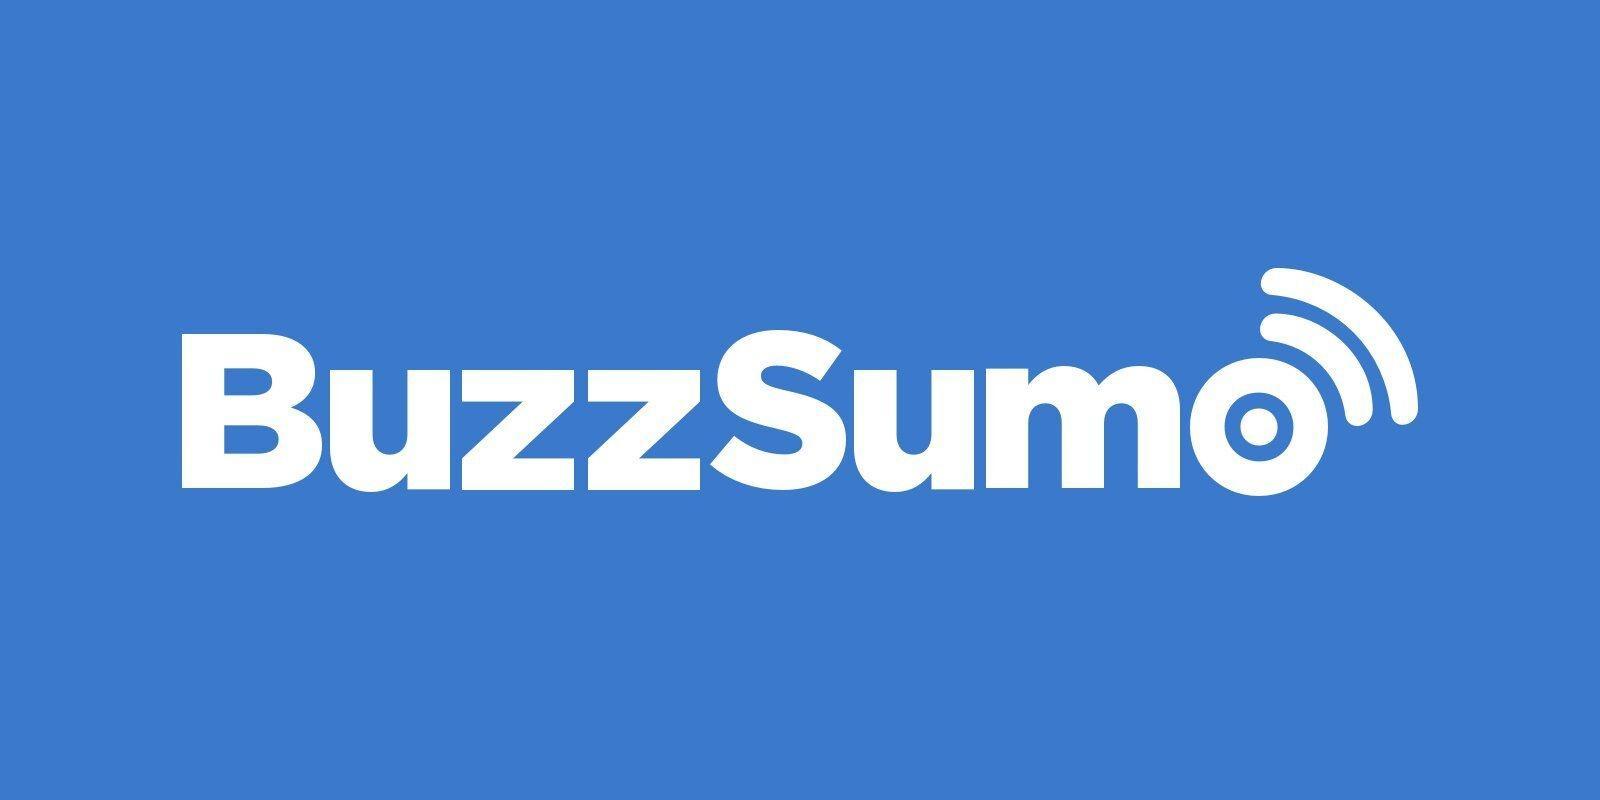 BuzzSumo-min.jpg